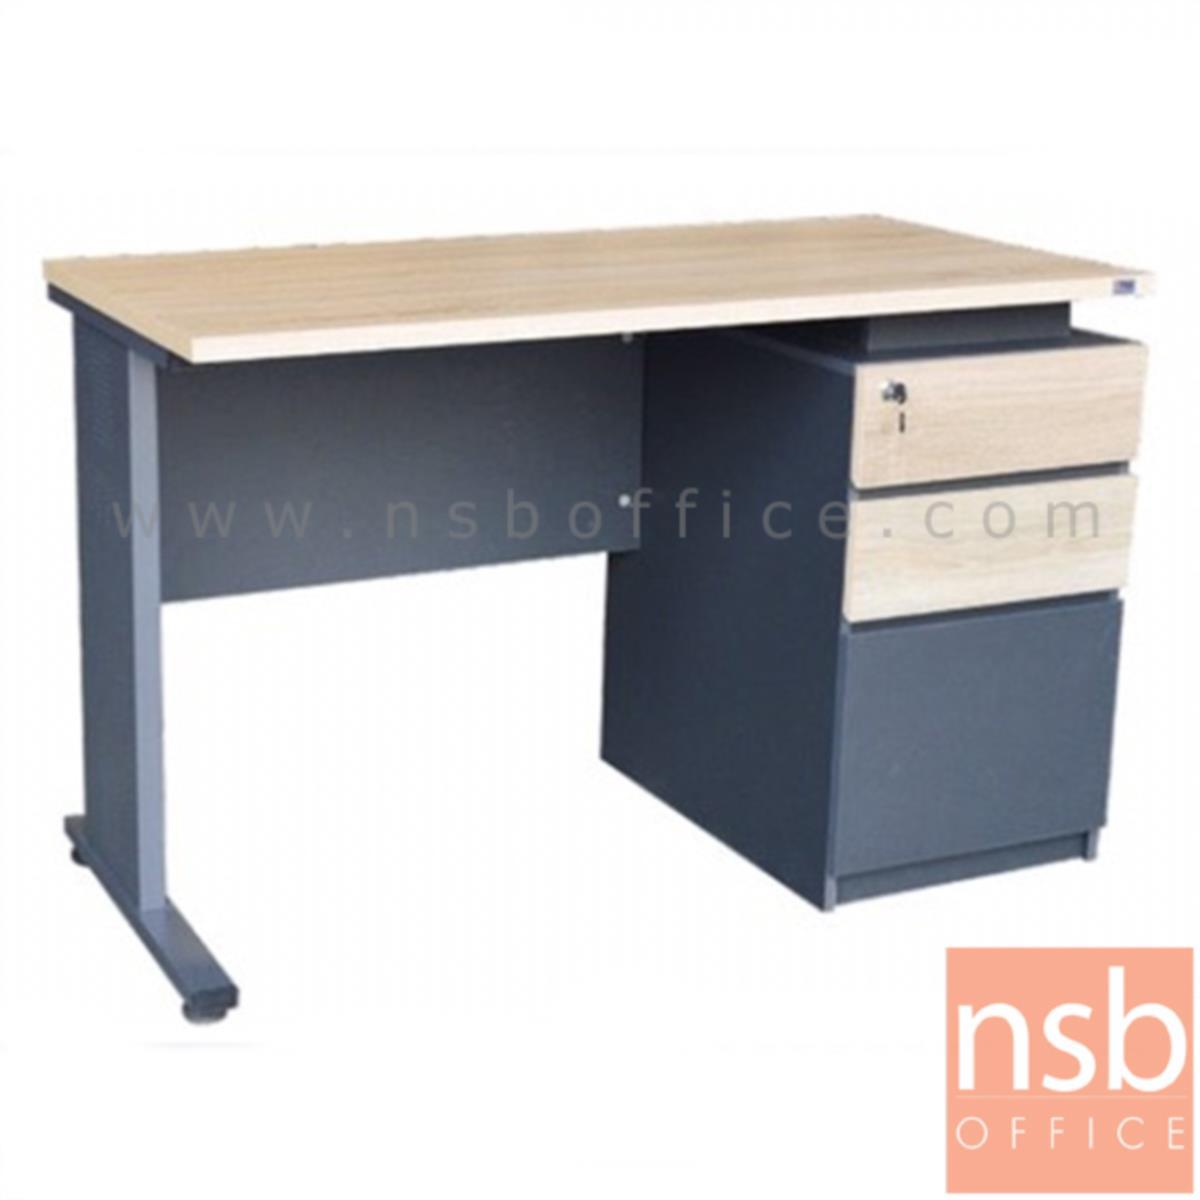 A10A067:โต๊ะทำงาน 3 ลิ้นชัก  รุ่น Cosmic (คอสมิค) ขนาด 120W cm. ขาเหล็ก  สีโซลิคตัดเทาเข้มหรือสีมูจิตัดเทาเข้ม